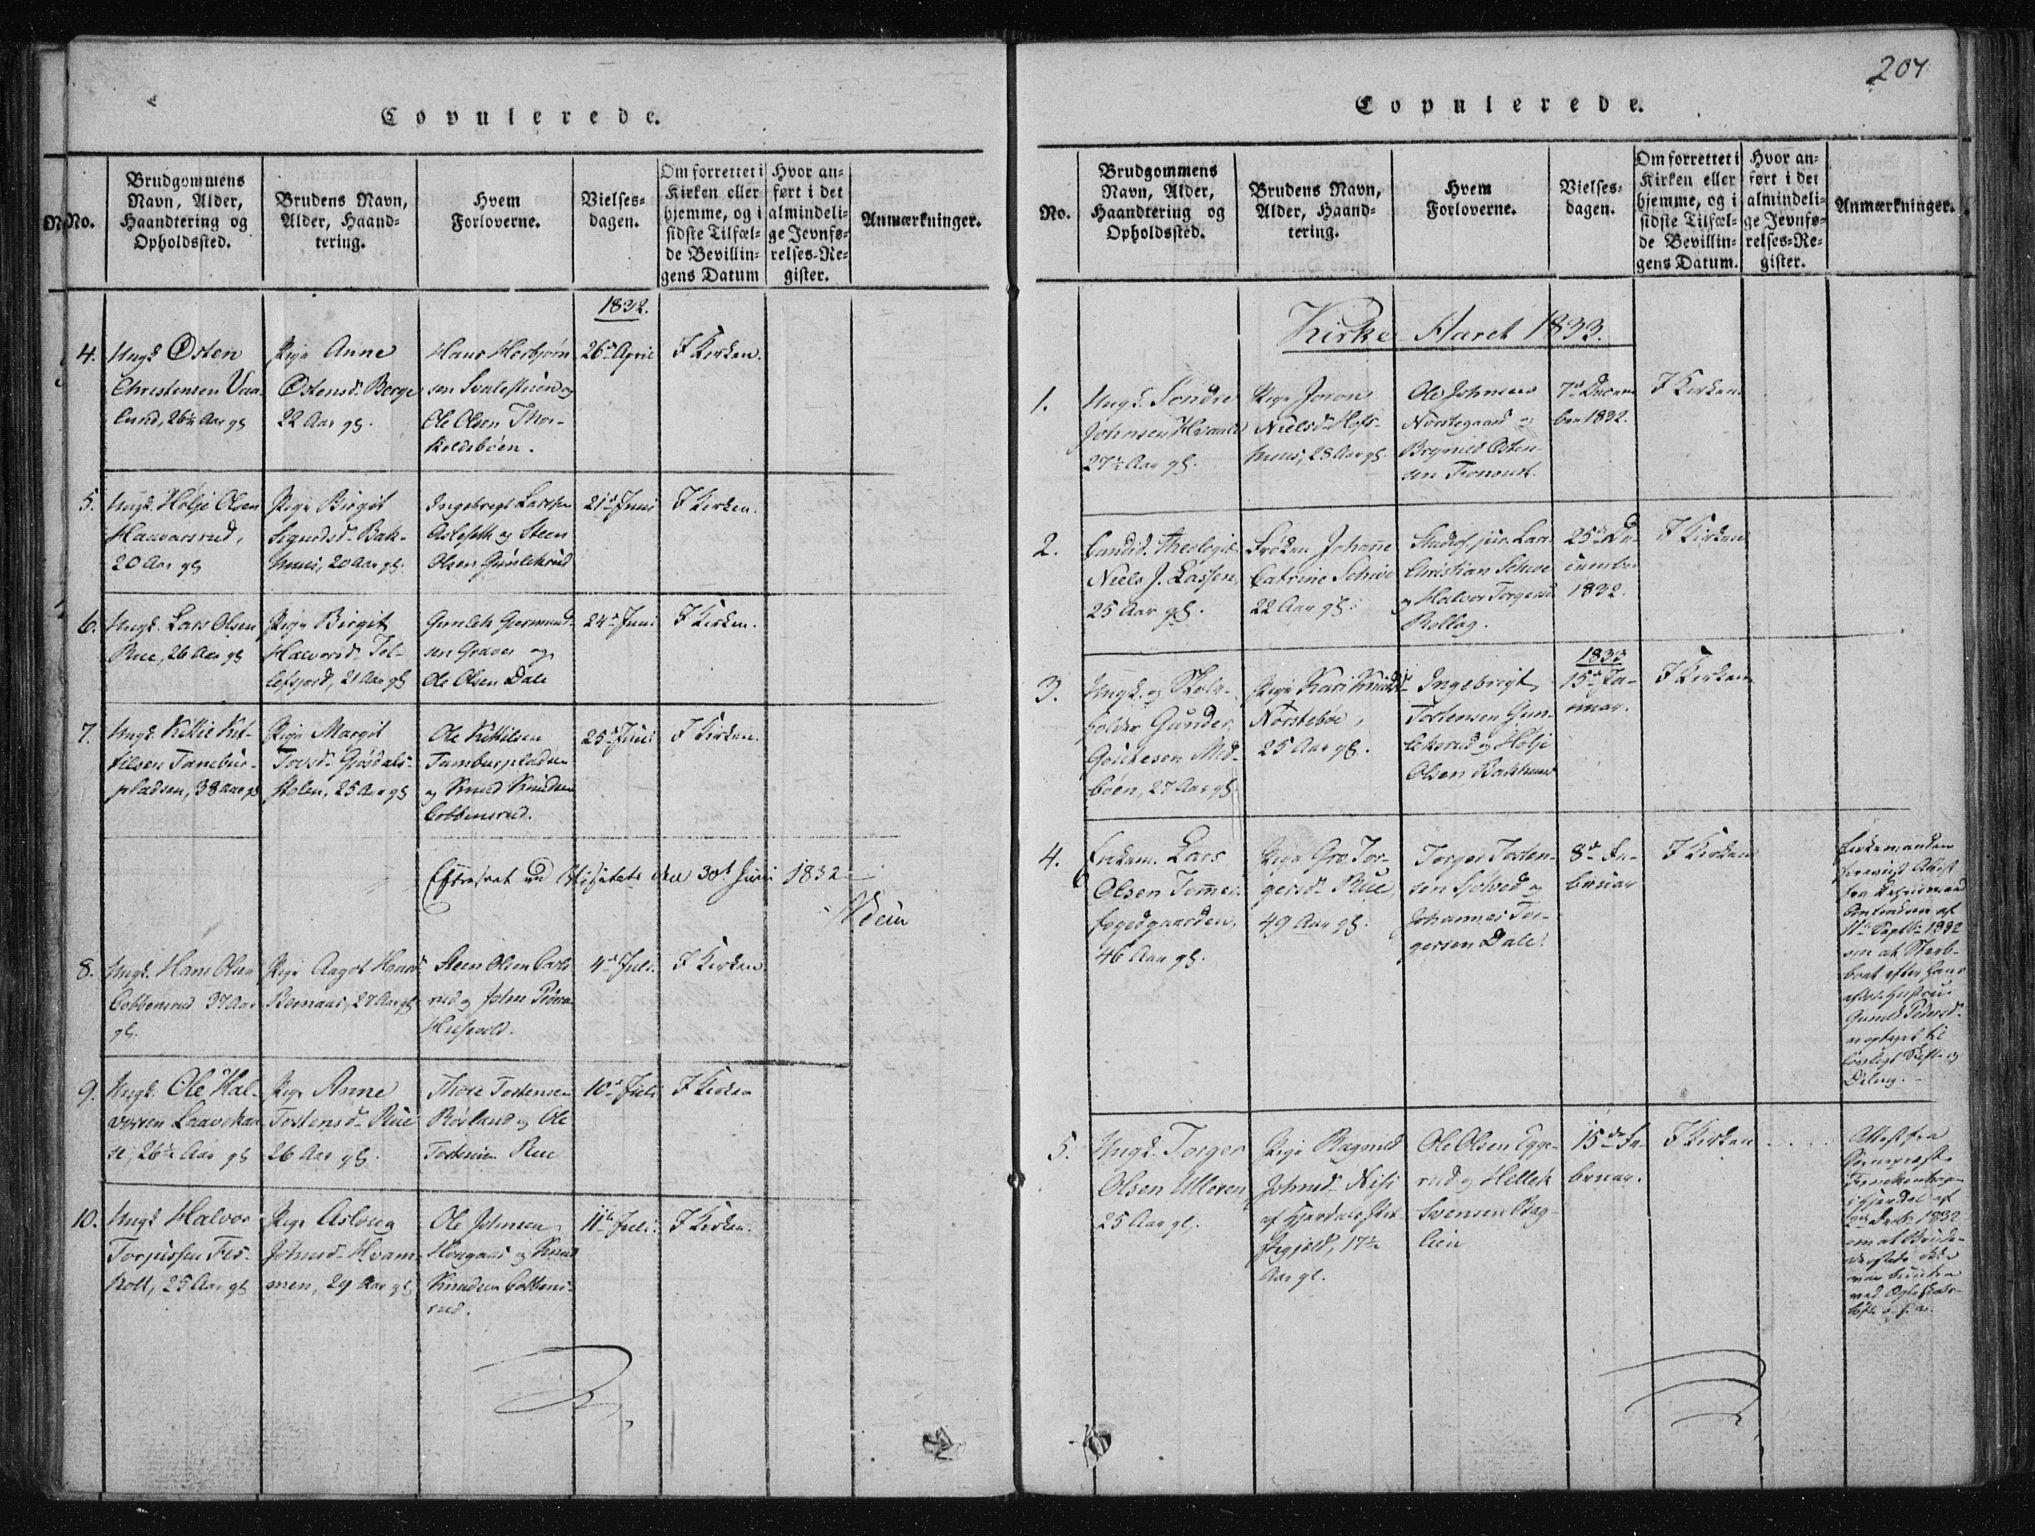 SAKO, Tinn kirkebøker, F/Fa/L0004: Ministerialbok nr. I 4, 1815-1843, s. 207